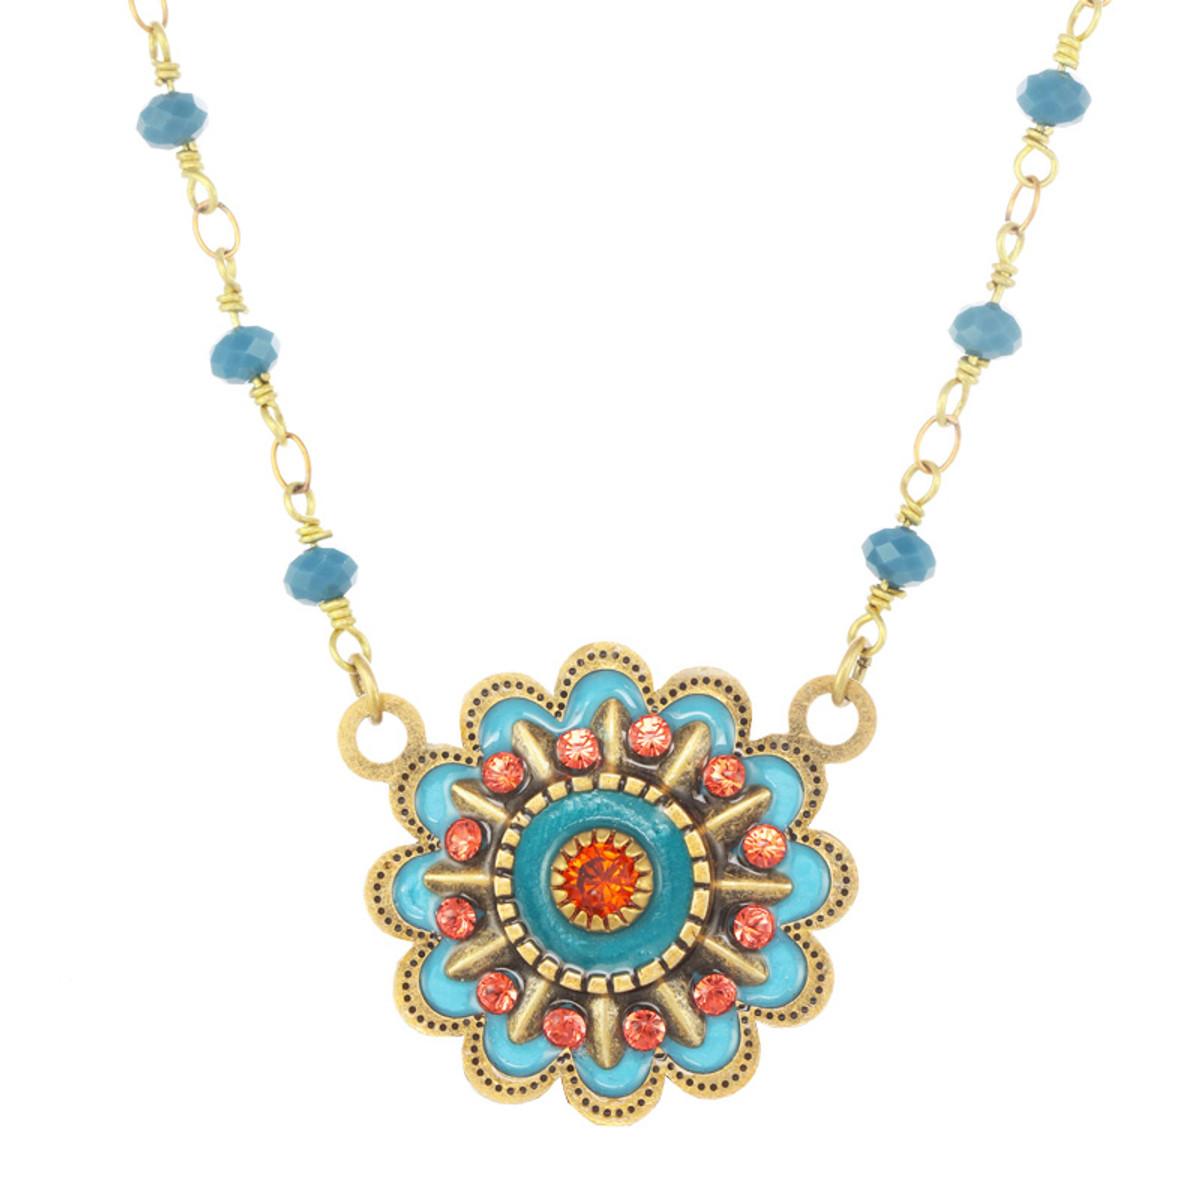 Michal Golan Sunshine Flower Necklace